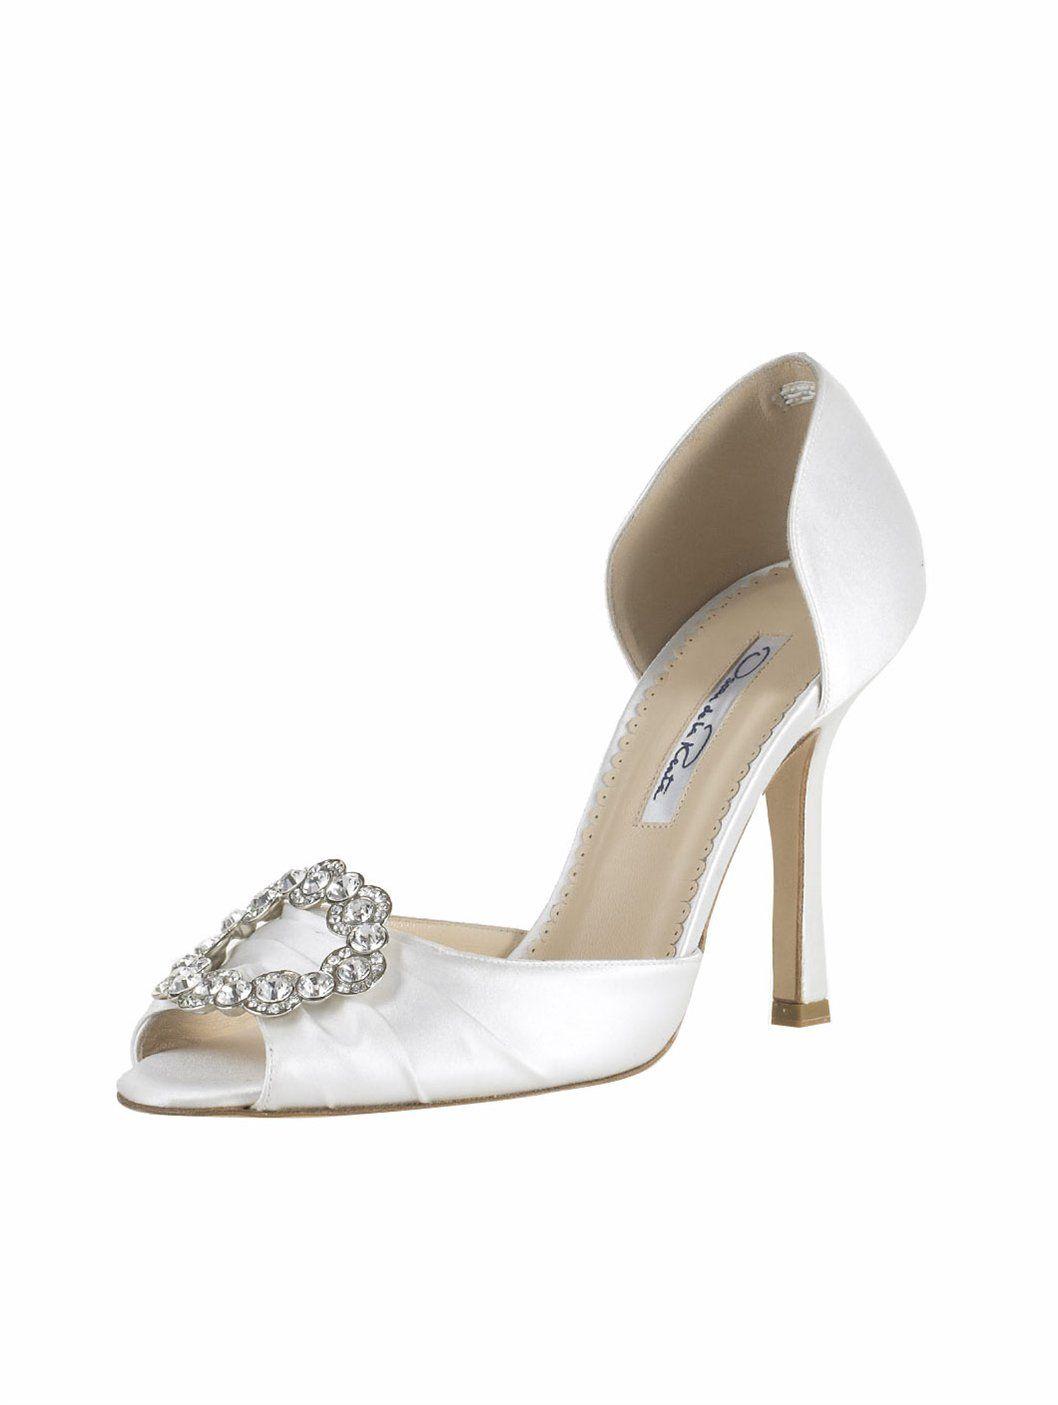 Oscar De La A Bridal Shoes Crystal Buckle Dorsay Http Womenspin